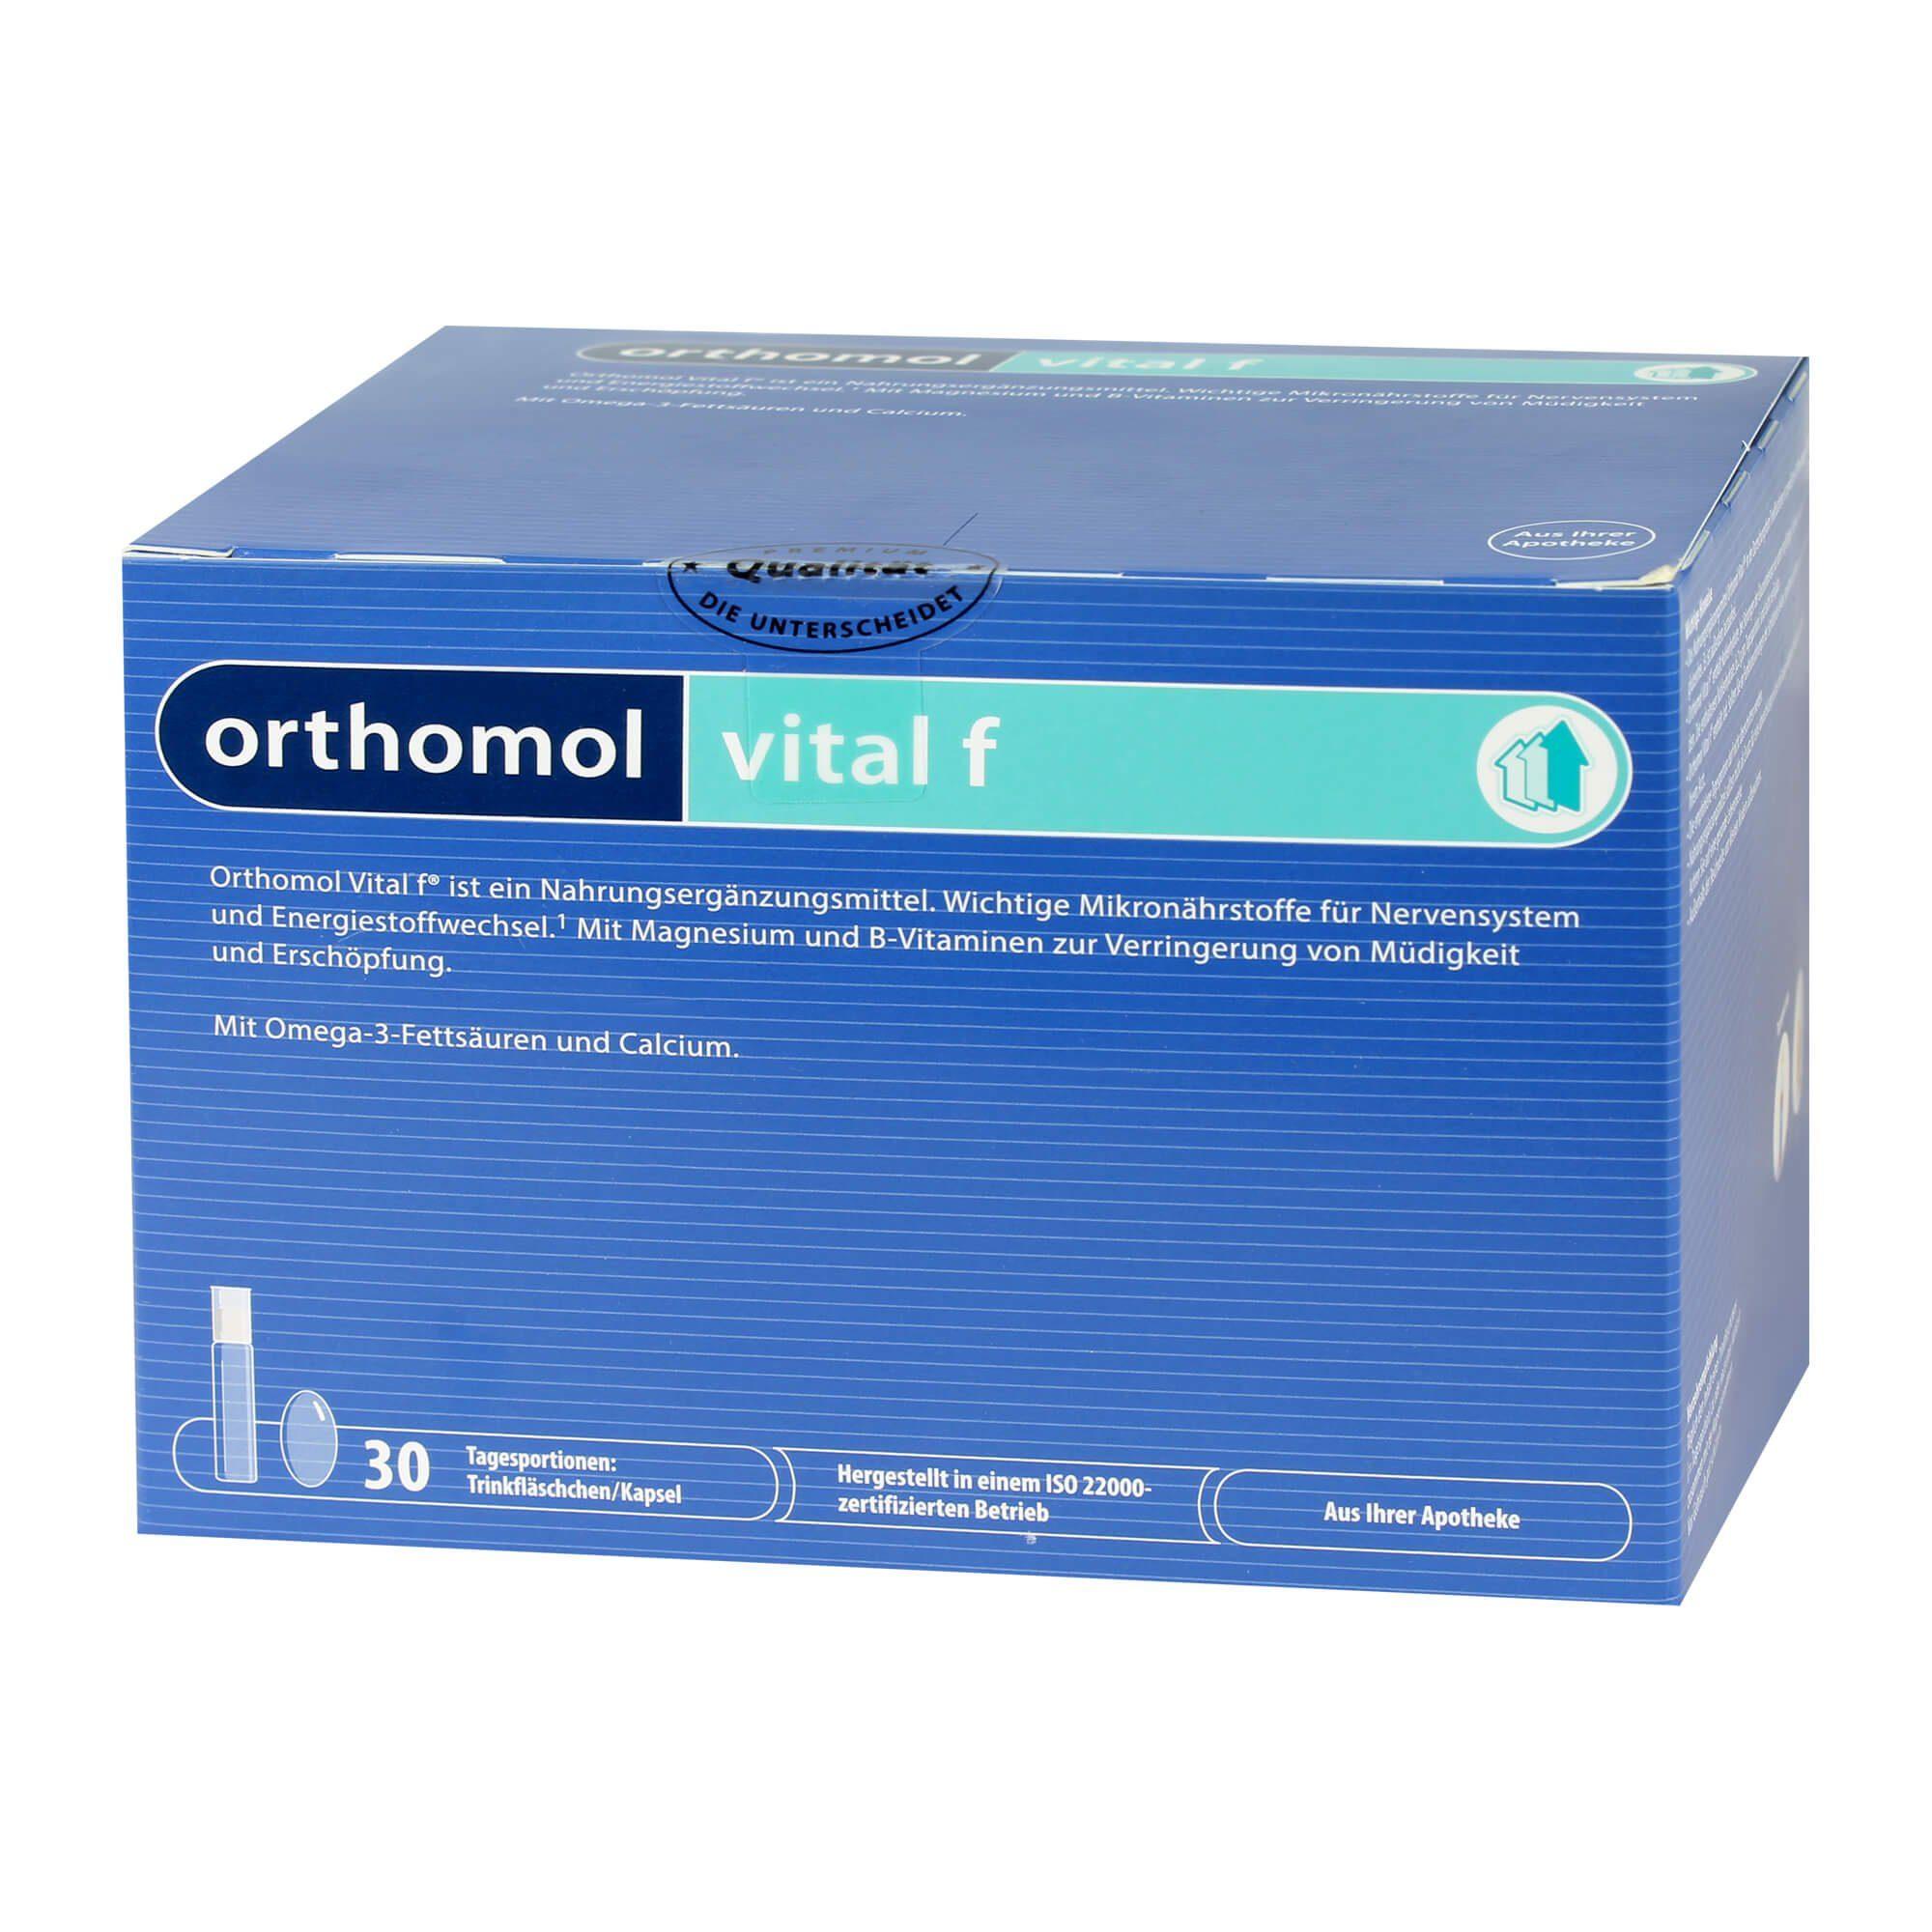 Orthomol Orthomol Vital F Trinkfläschchen , 30 St